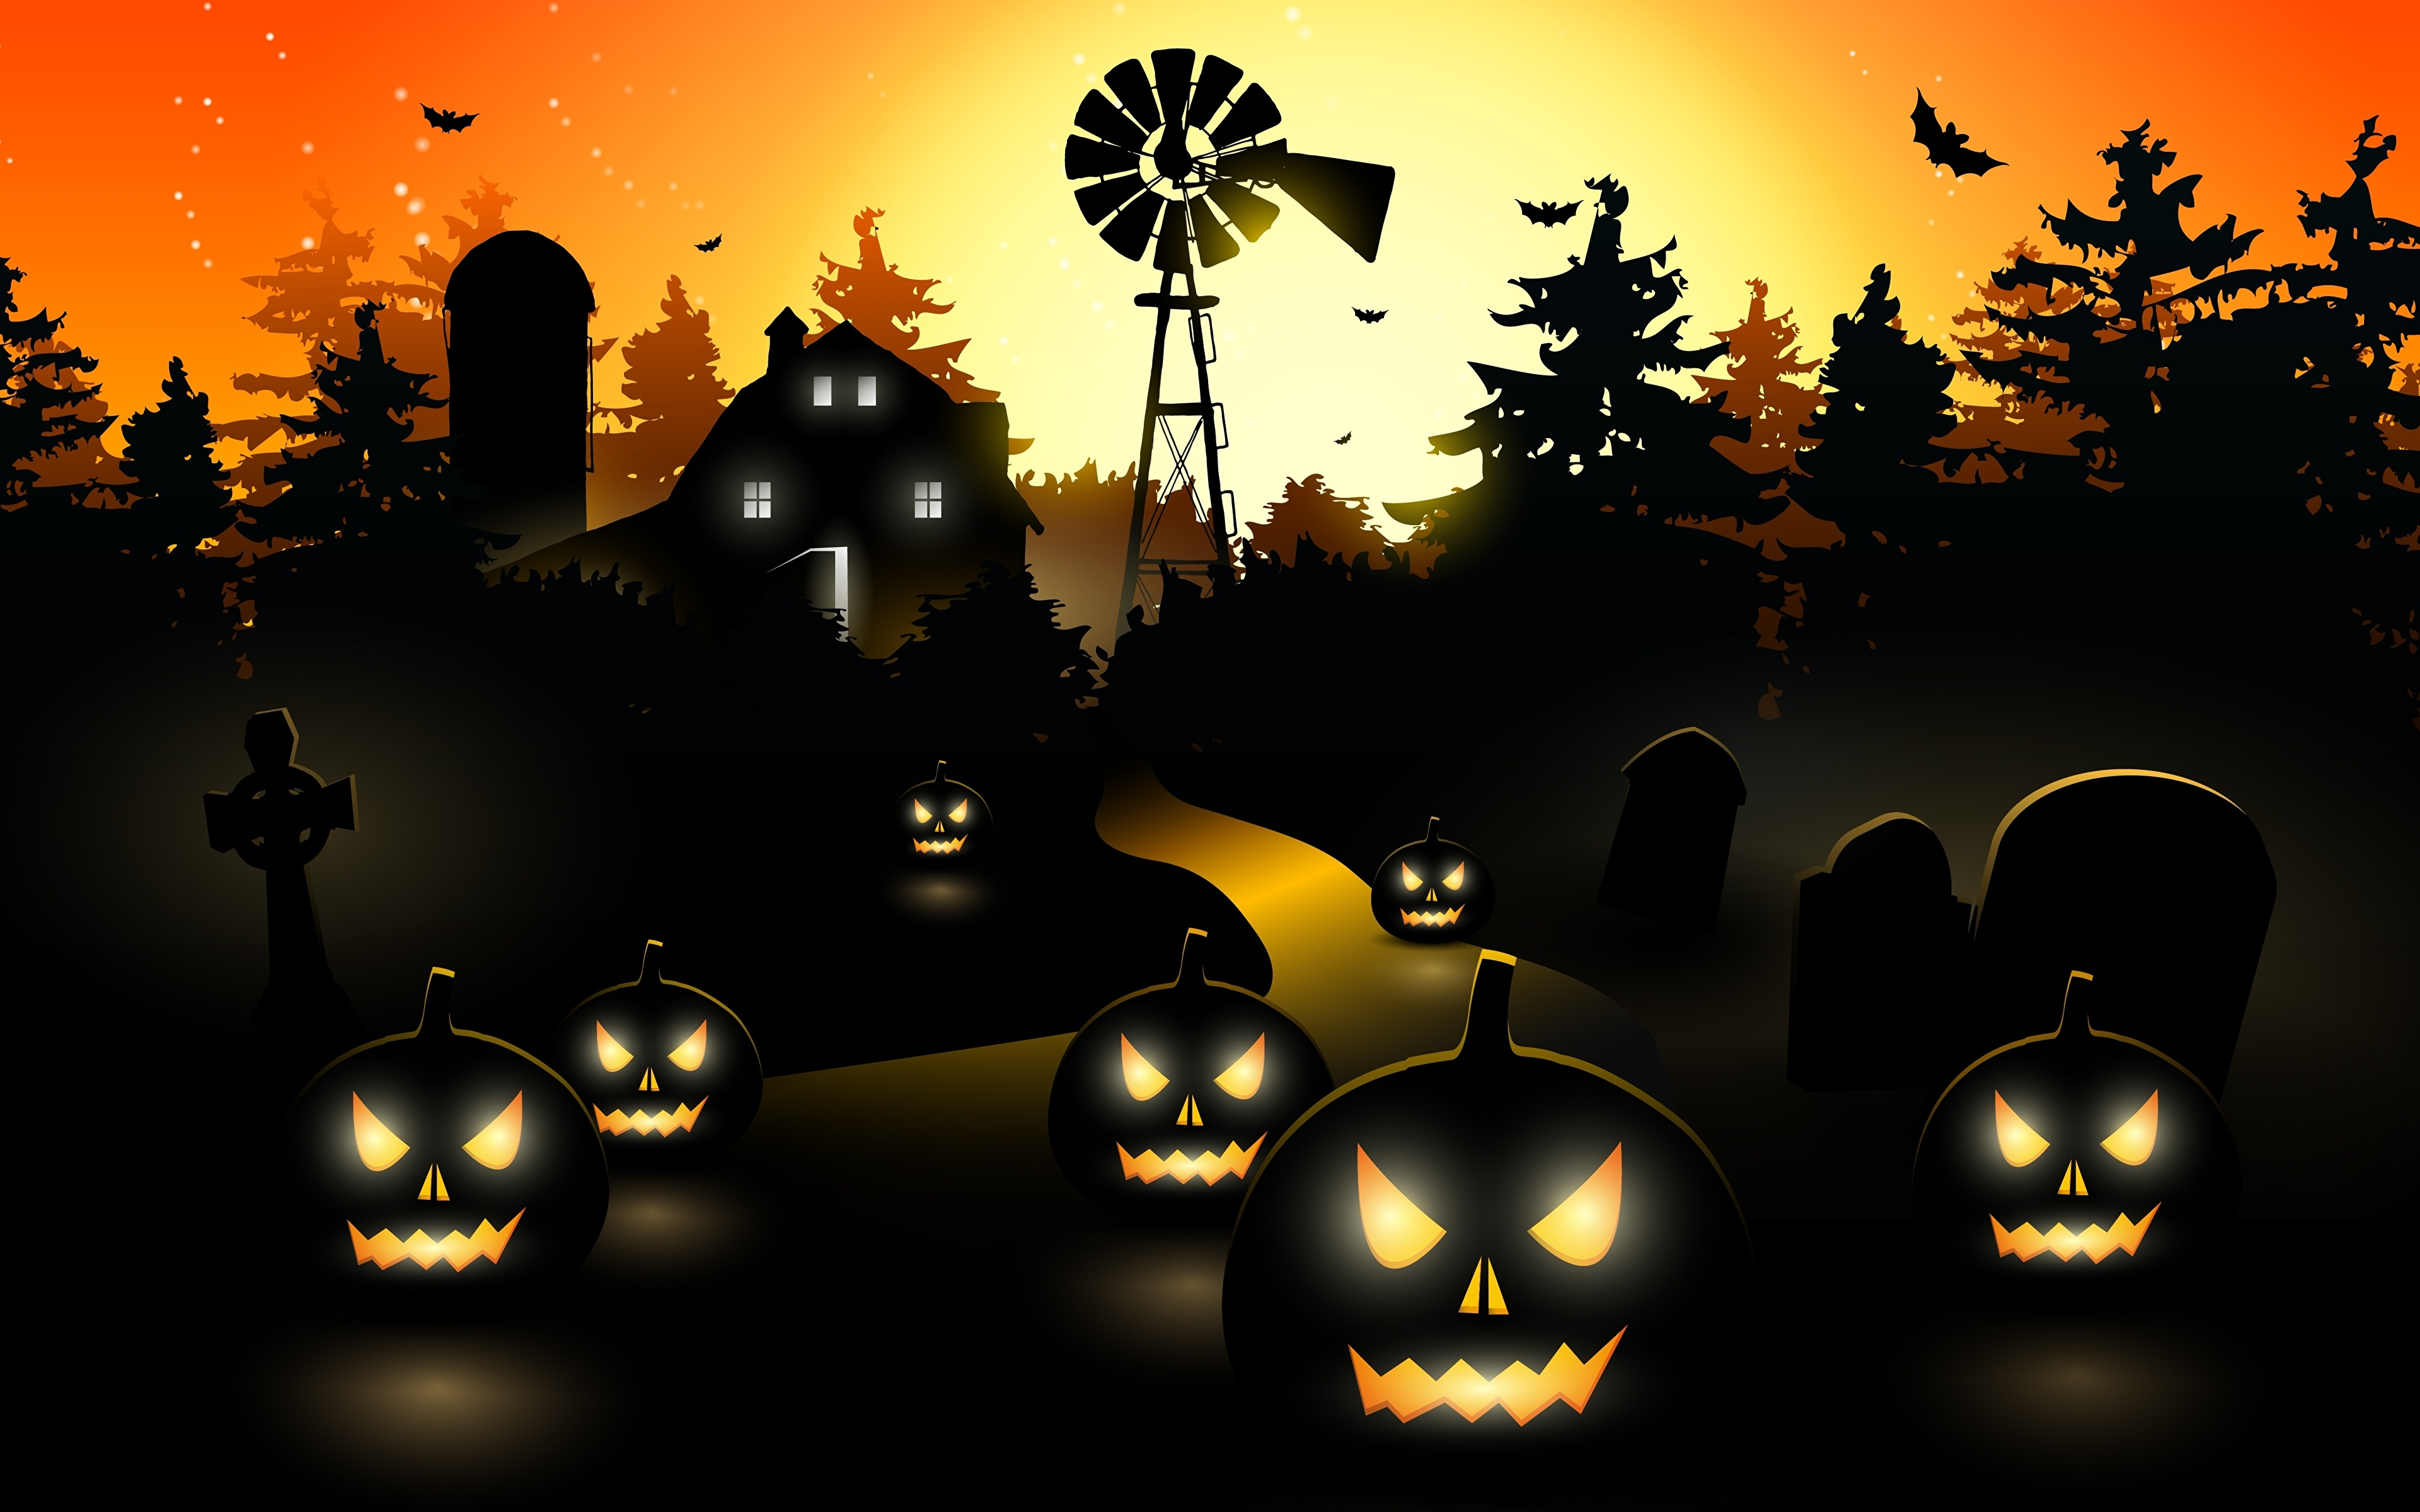 графика хэллоуин graphics Halloween загрузить